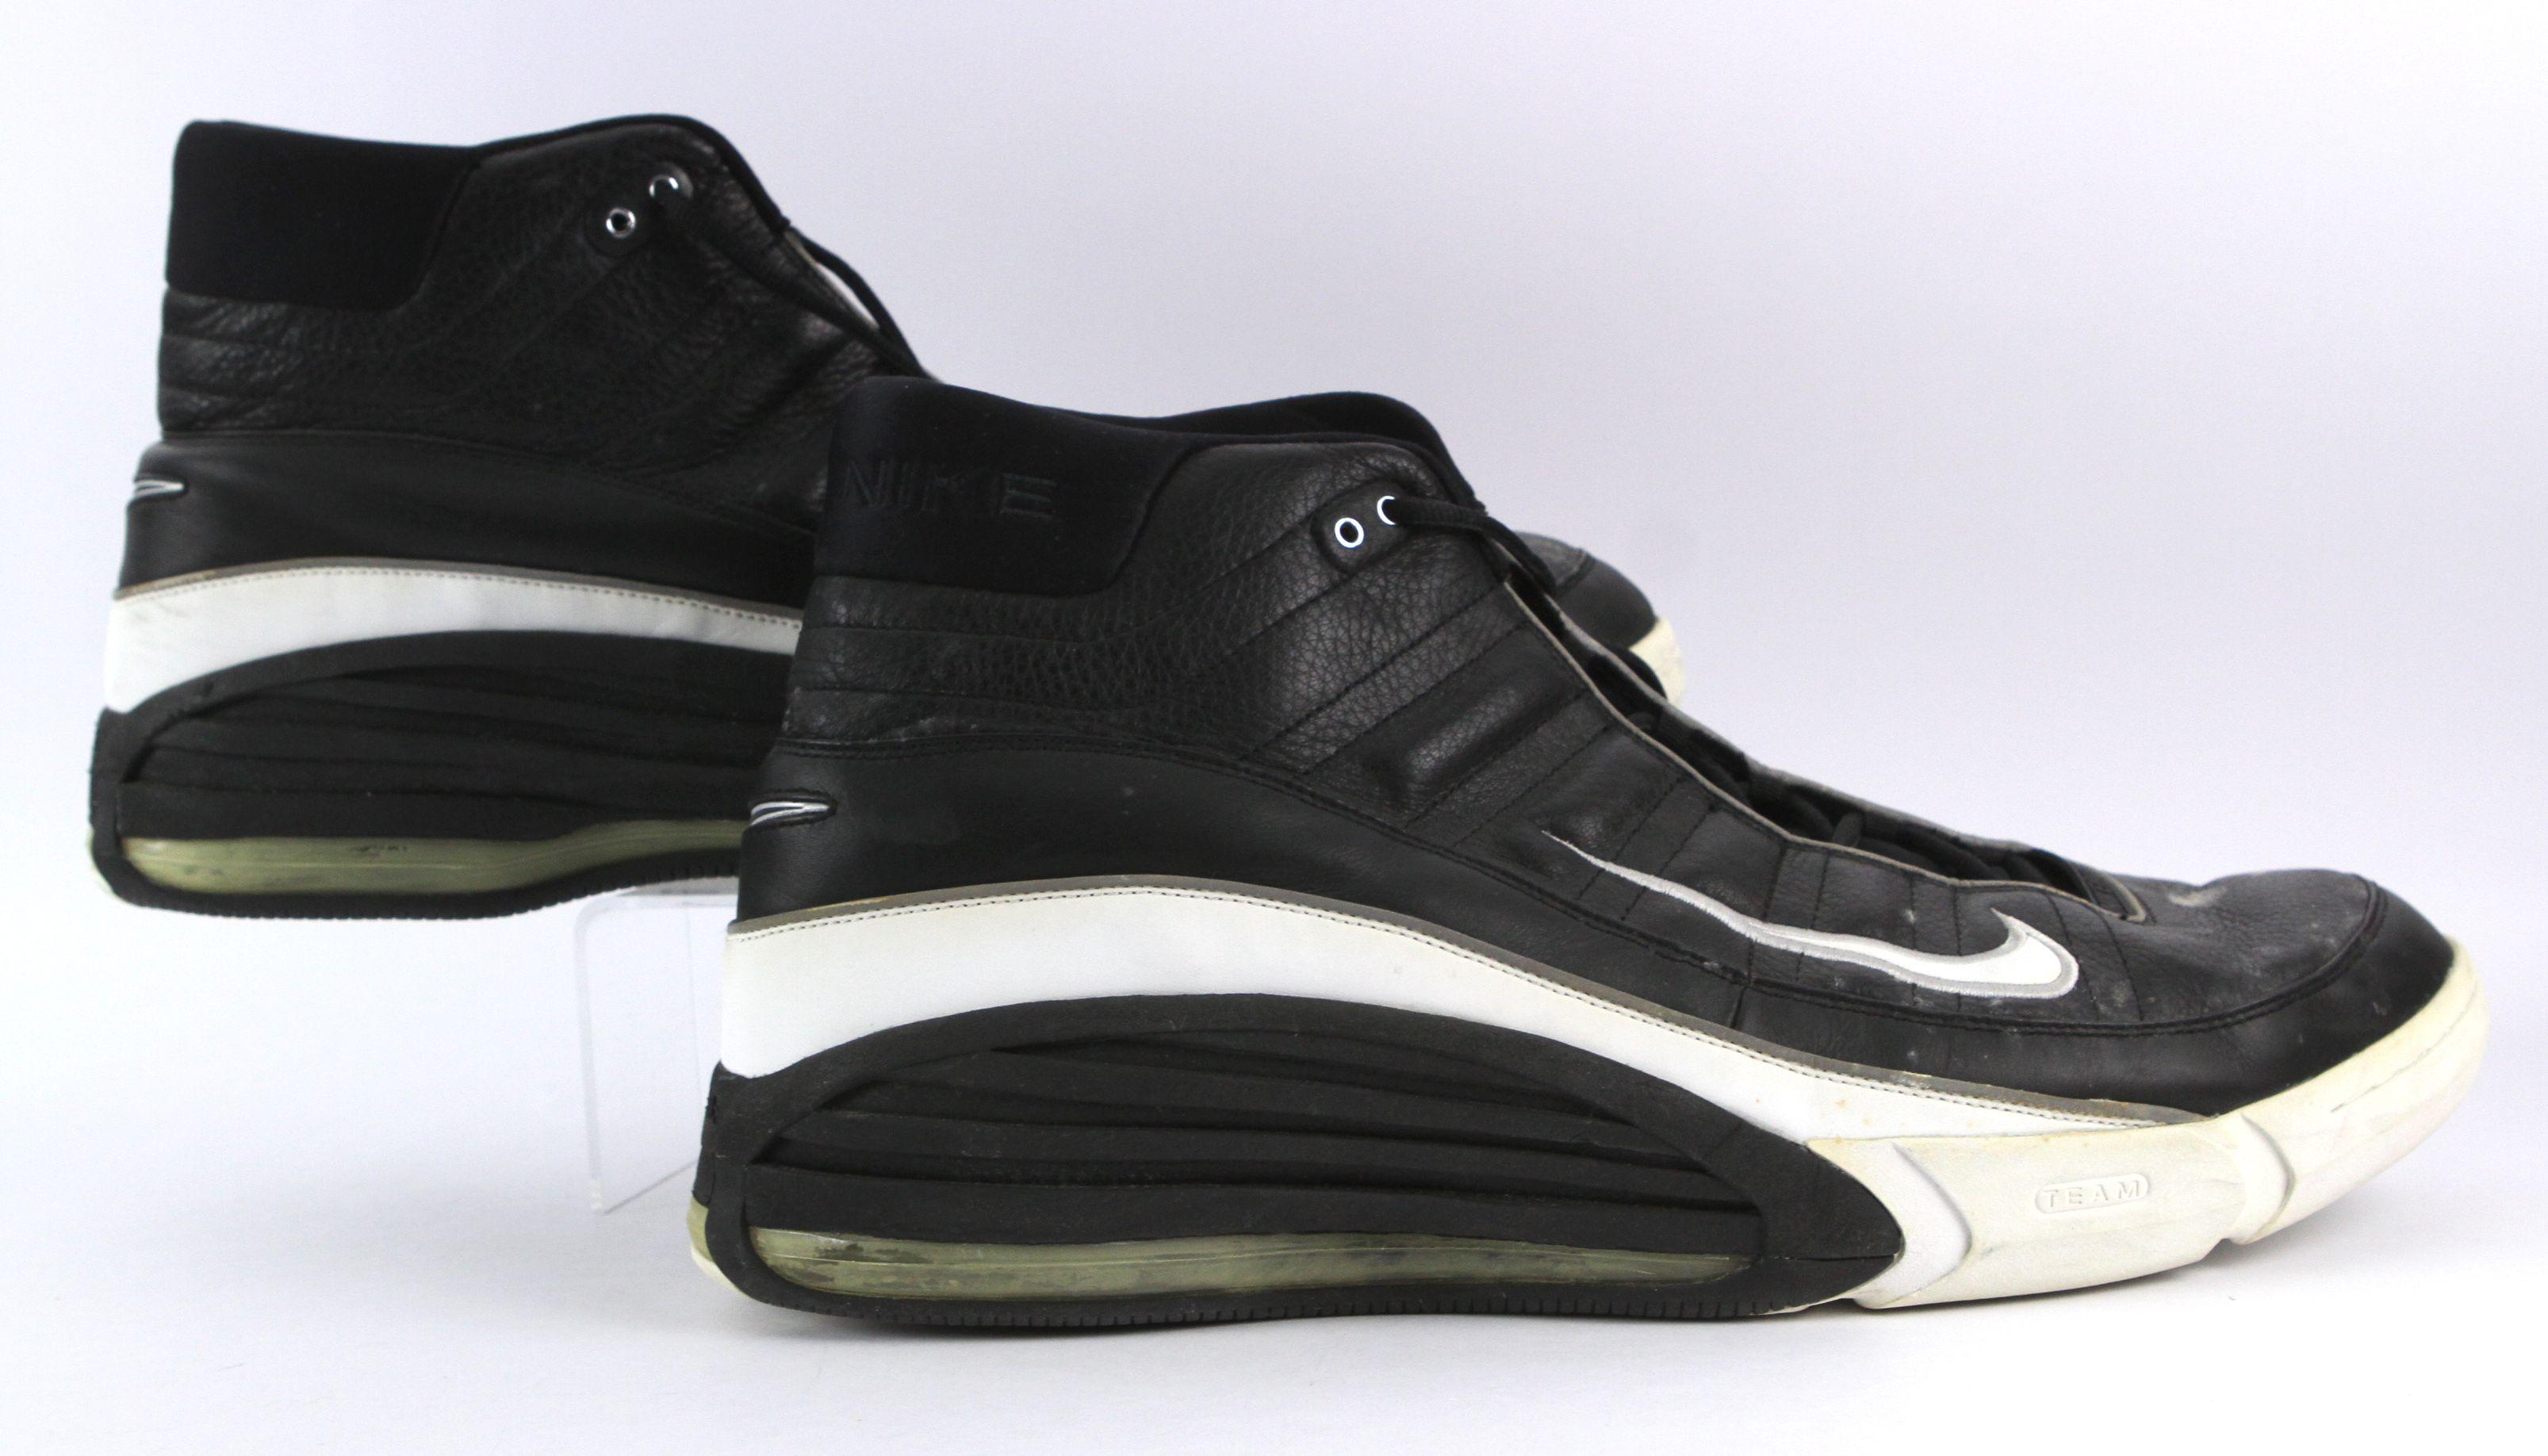 Respiración Tantos Amabilidad  Lot Detail - 2000-01 circa Dikembe Mutombo Atlanta Hawks/Philadelphia 76ers  Game Worn Nike Sneakers (MEARS LOA)